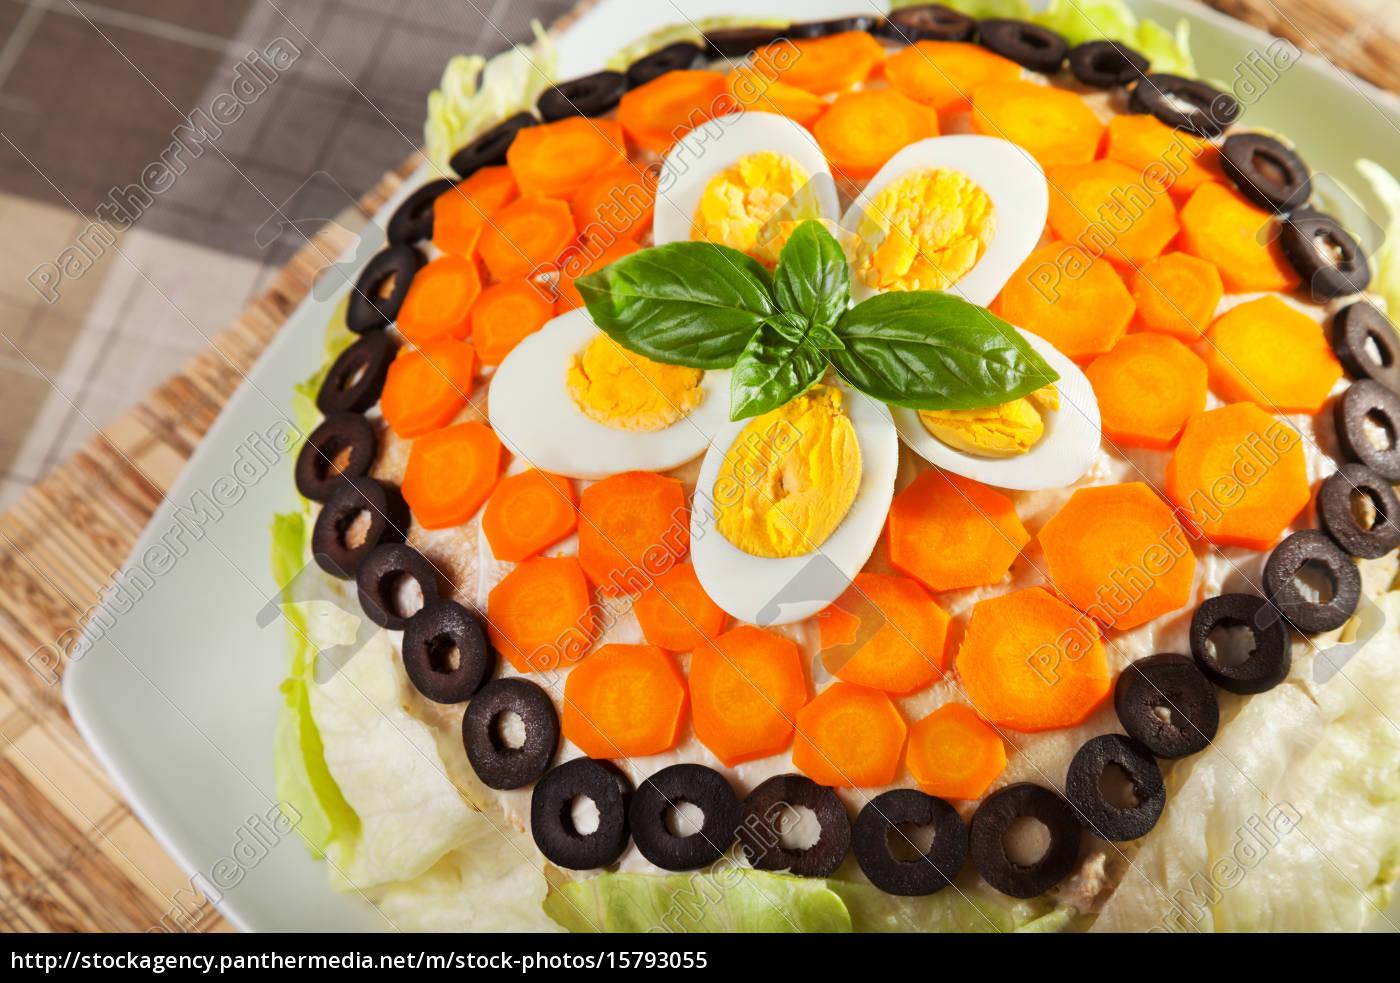 salty, pancake, cake, salty, pancake, cake, salty, pancake - 15793055